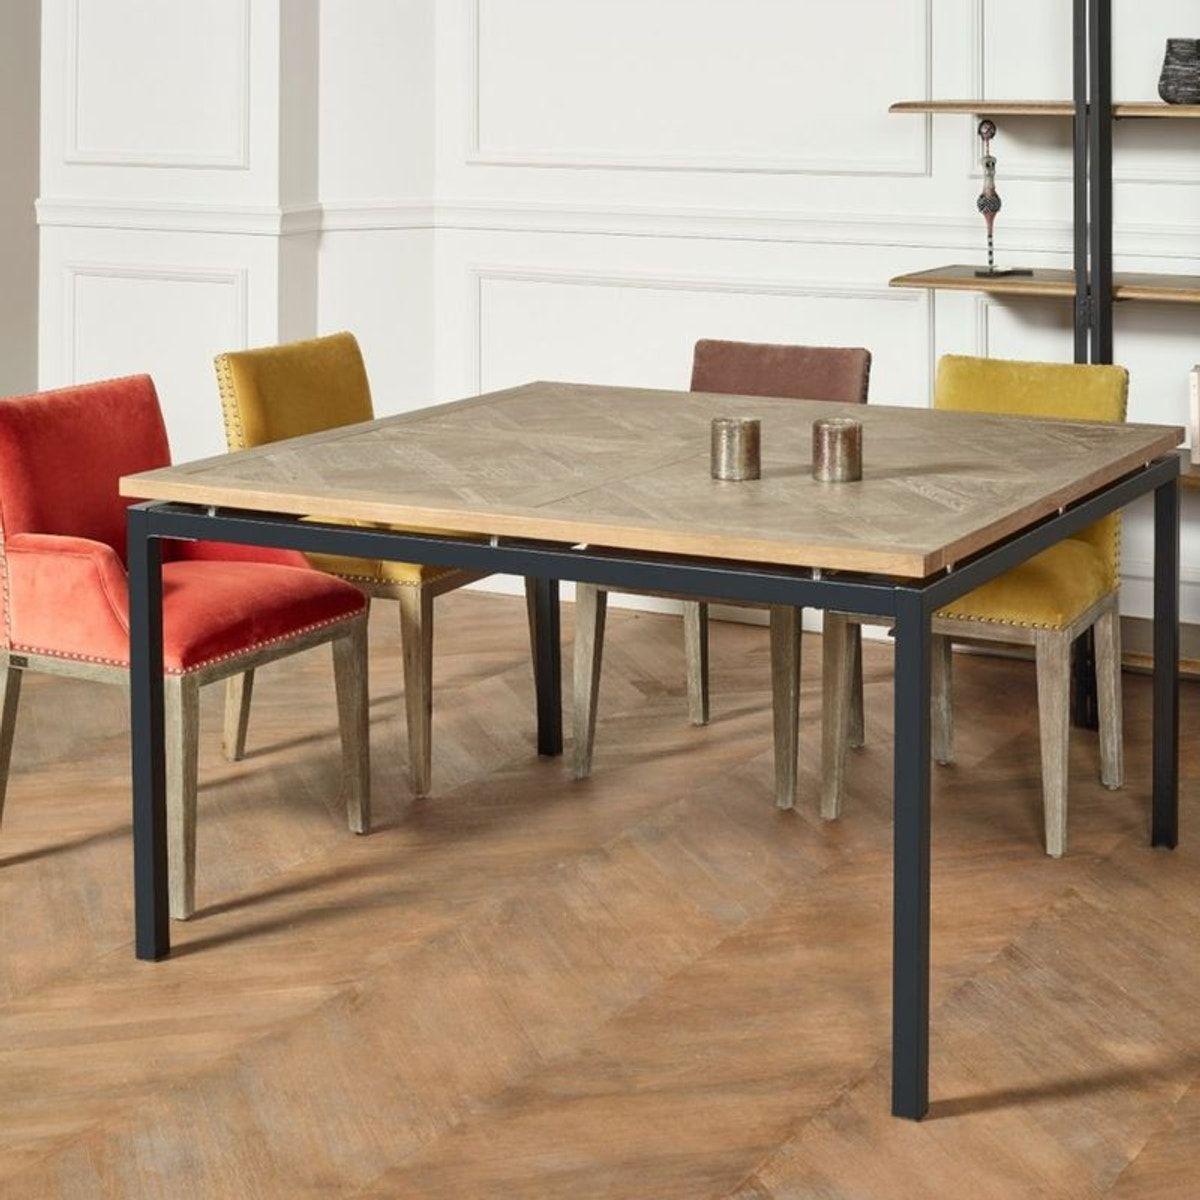 Table Carree Chene Massif Pieds Metal Zazie Table Salle A Manger Salle A Manger Table Carree Table Carree